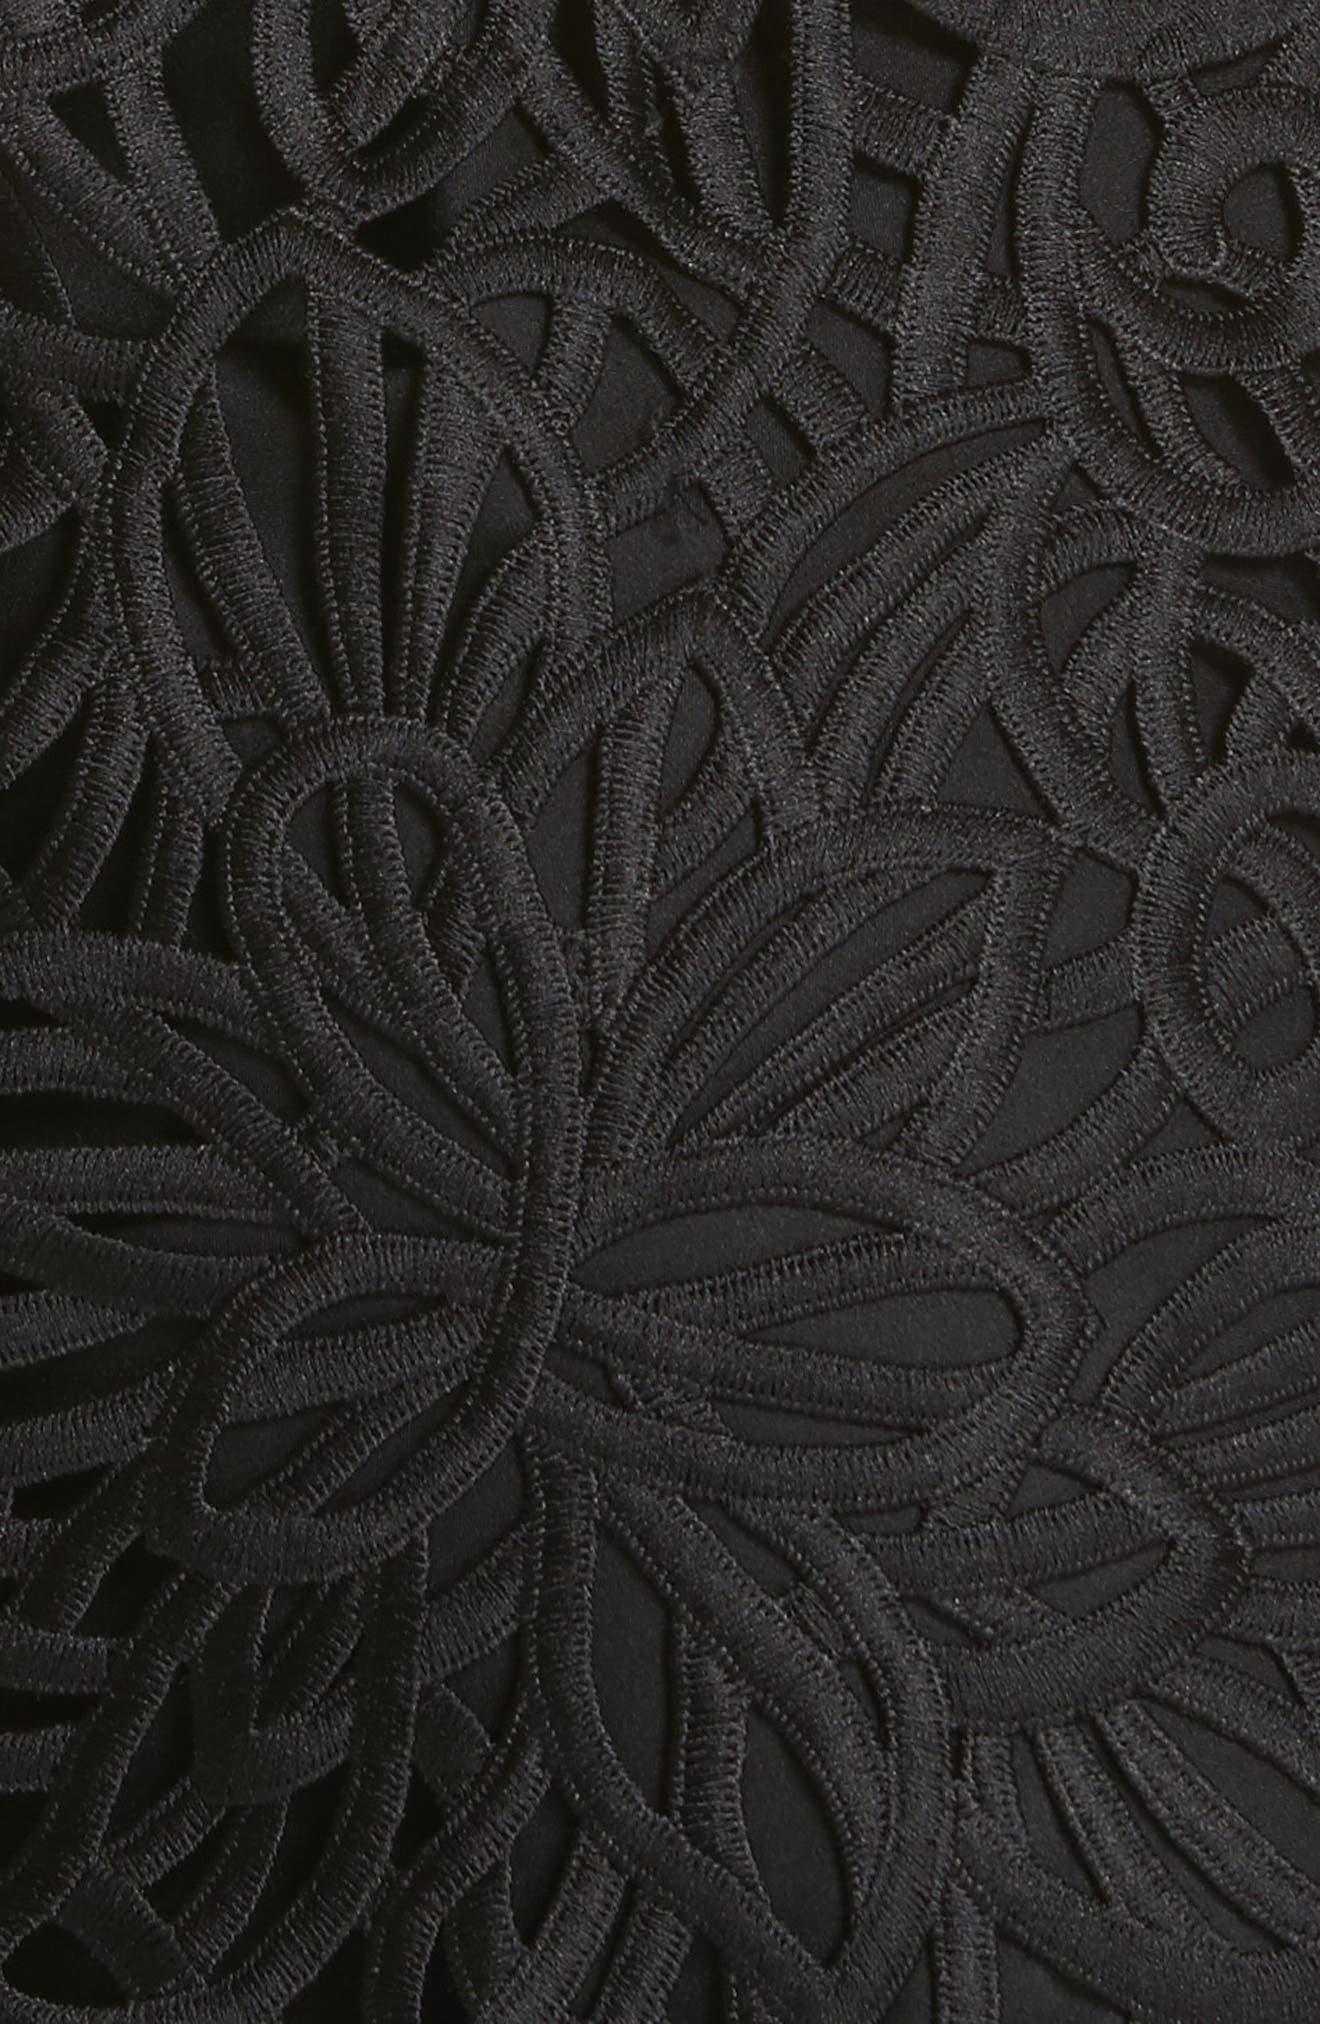 Chloe Lace Shift Dress,                             Alternate thumbnail 5, color,                             Black